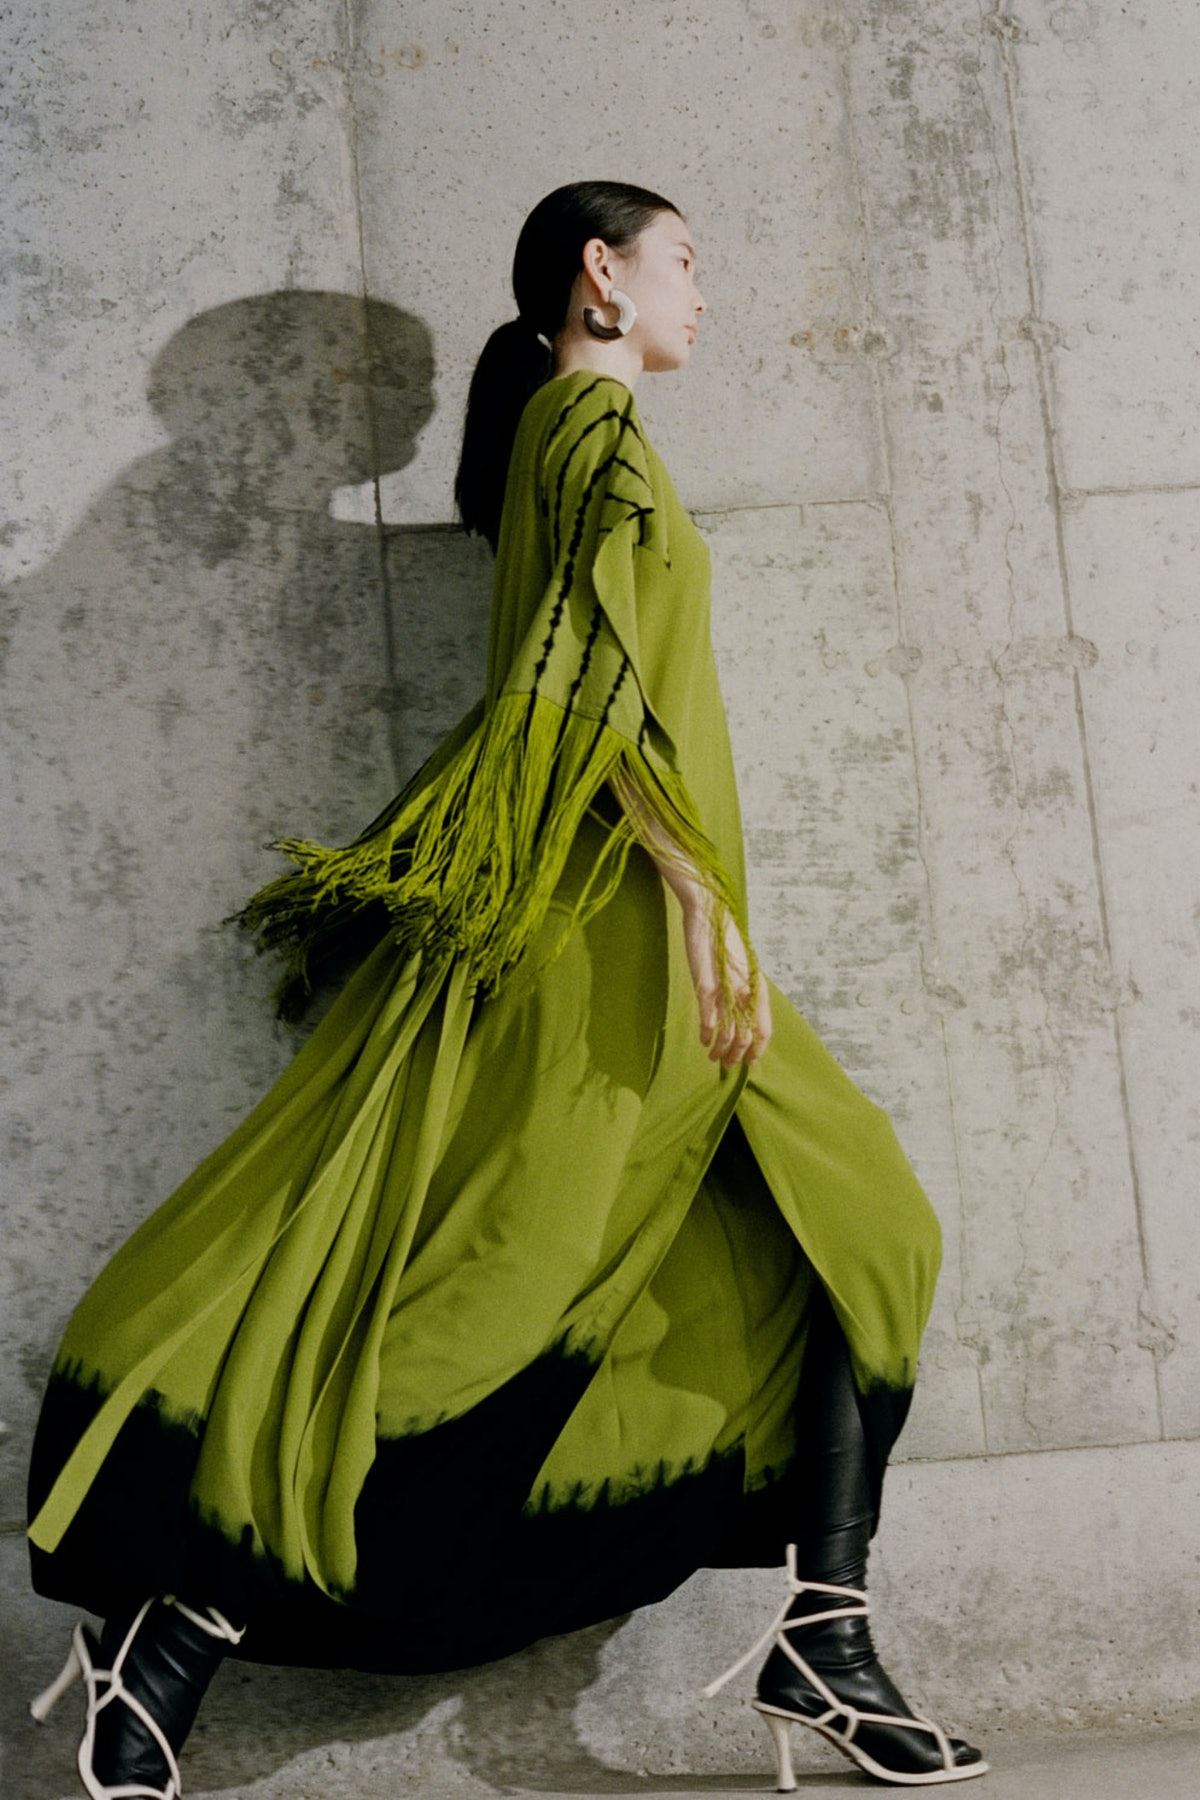 Model wears Proenza Schouler Fall/Winter 2021 collection.